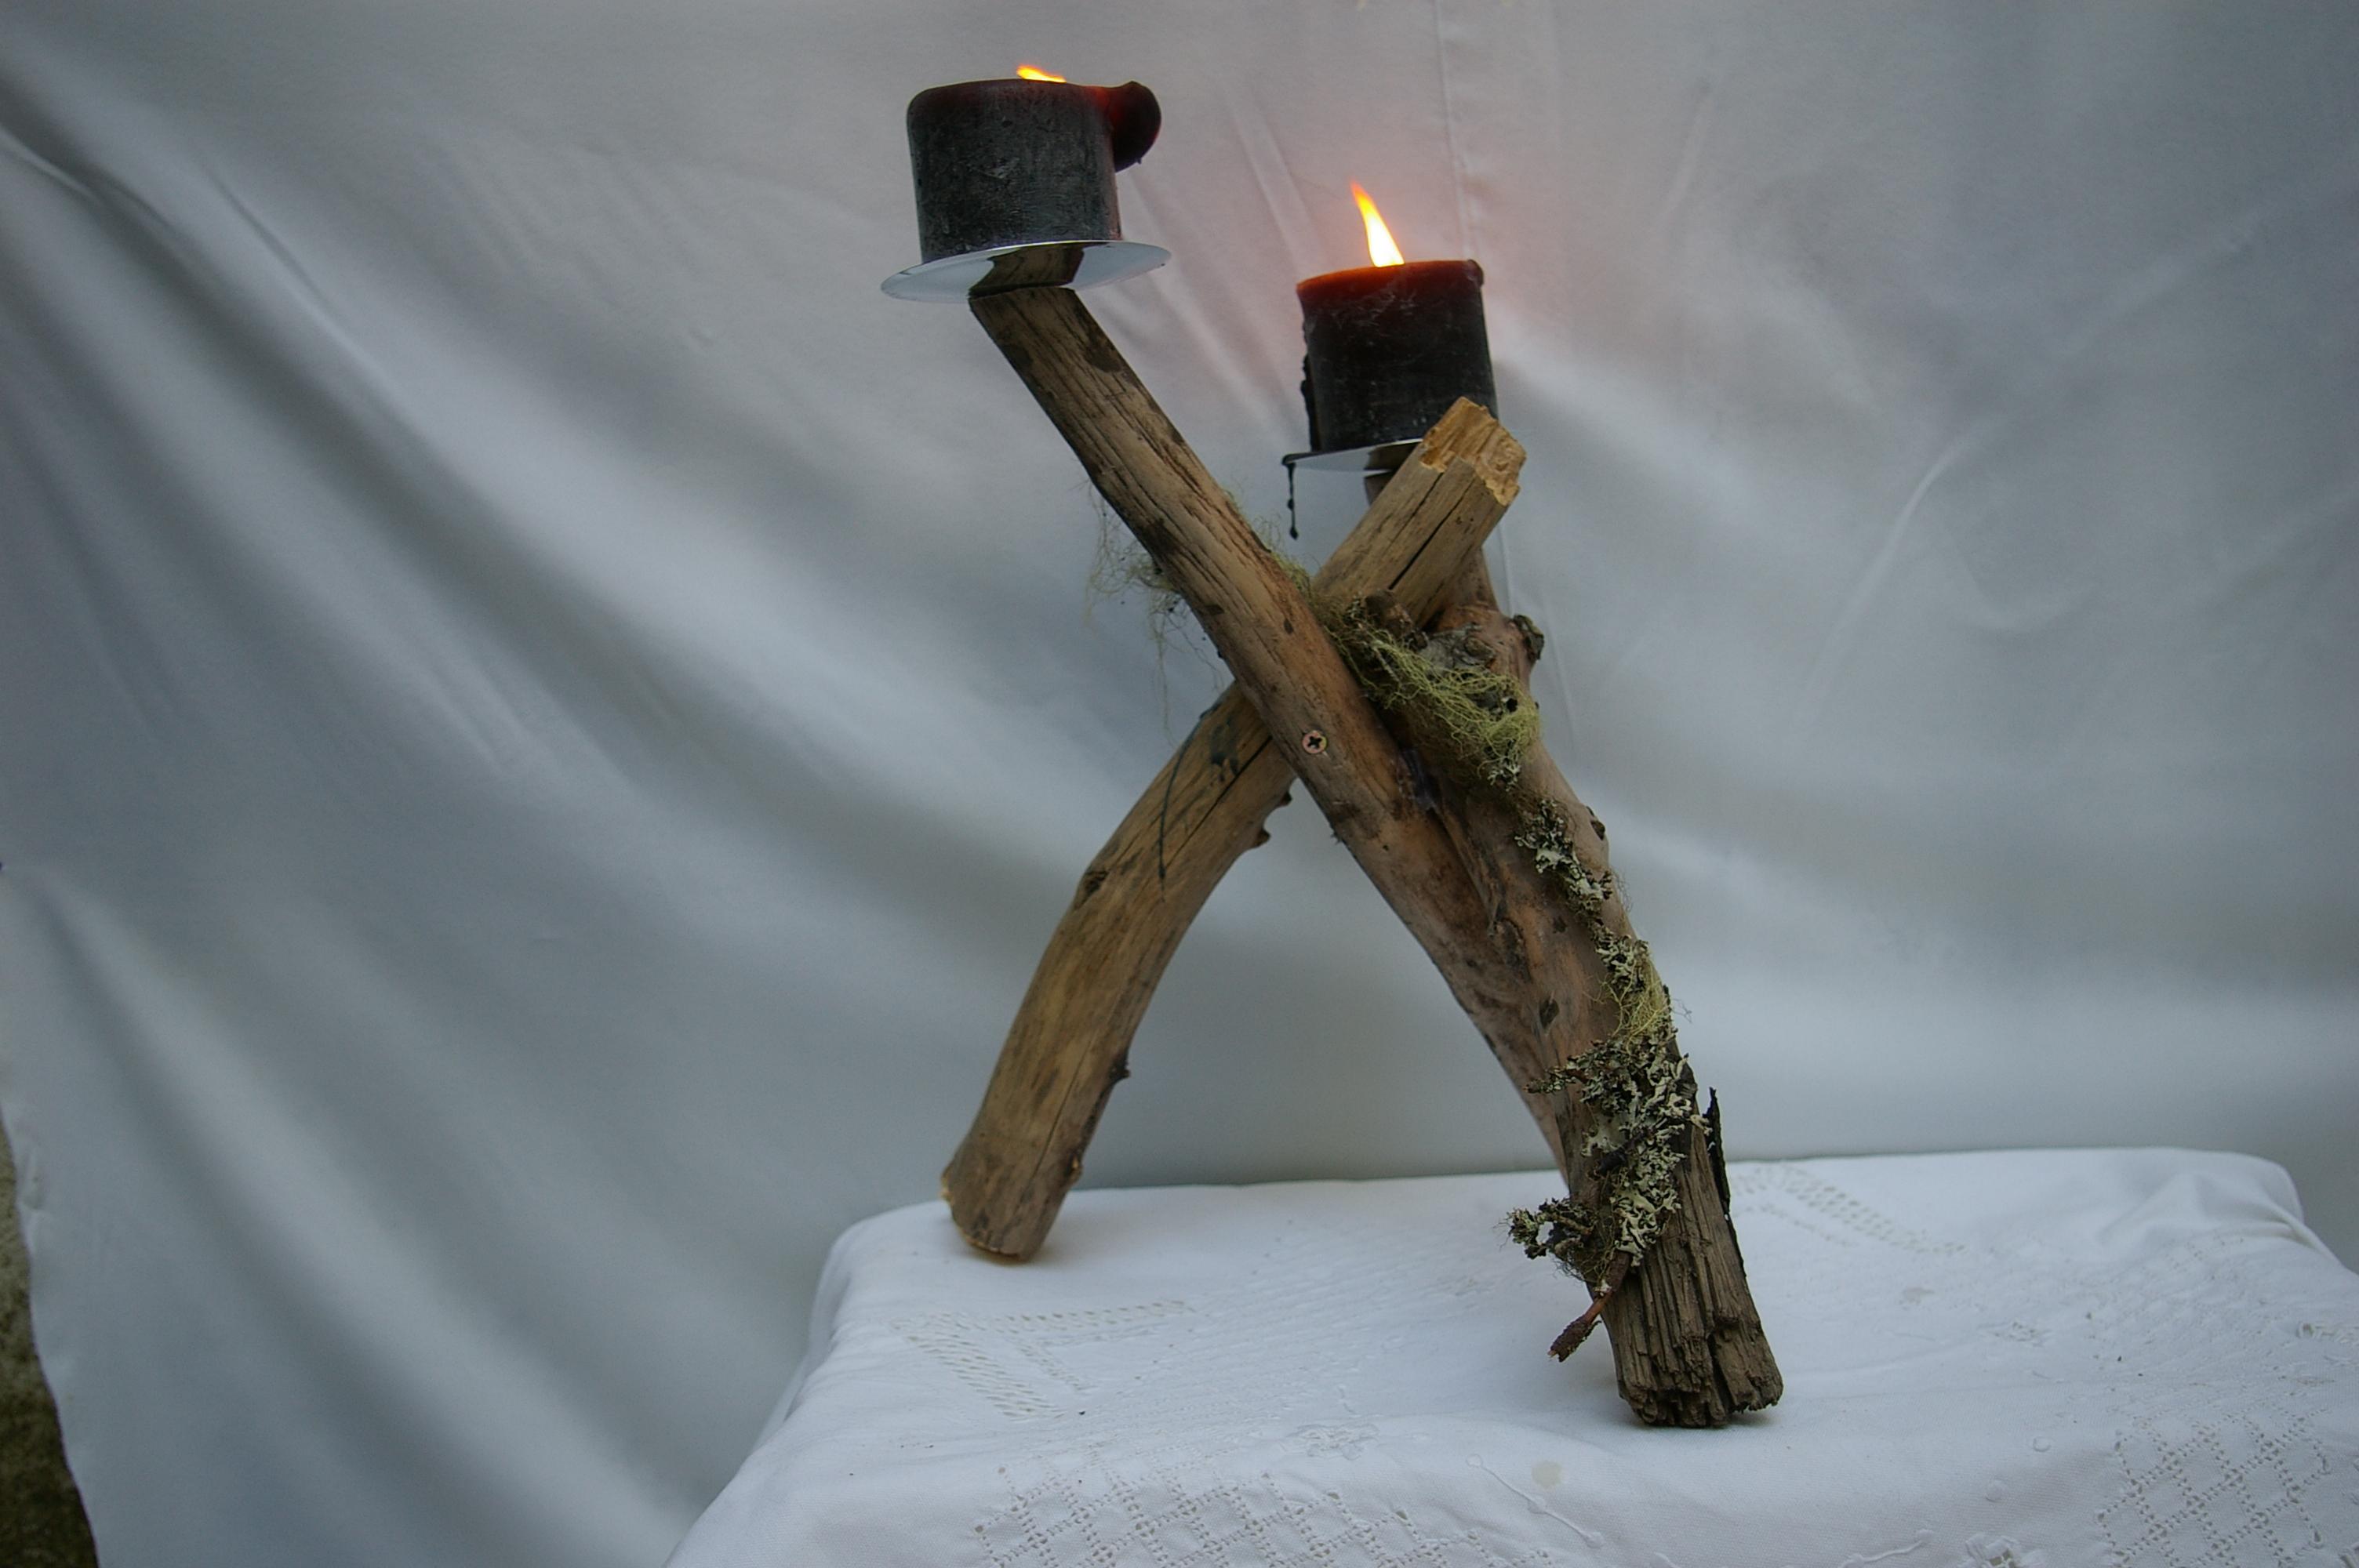 Kerzenständer mit Kerzen